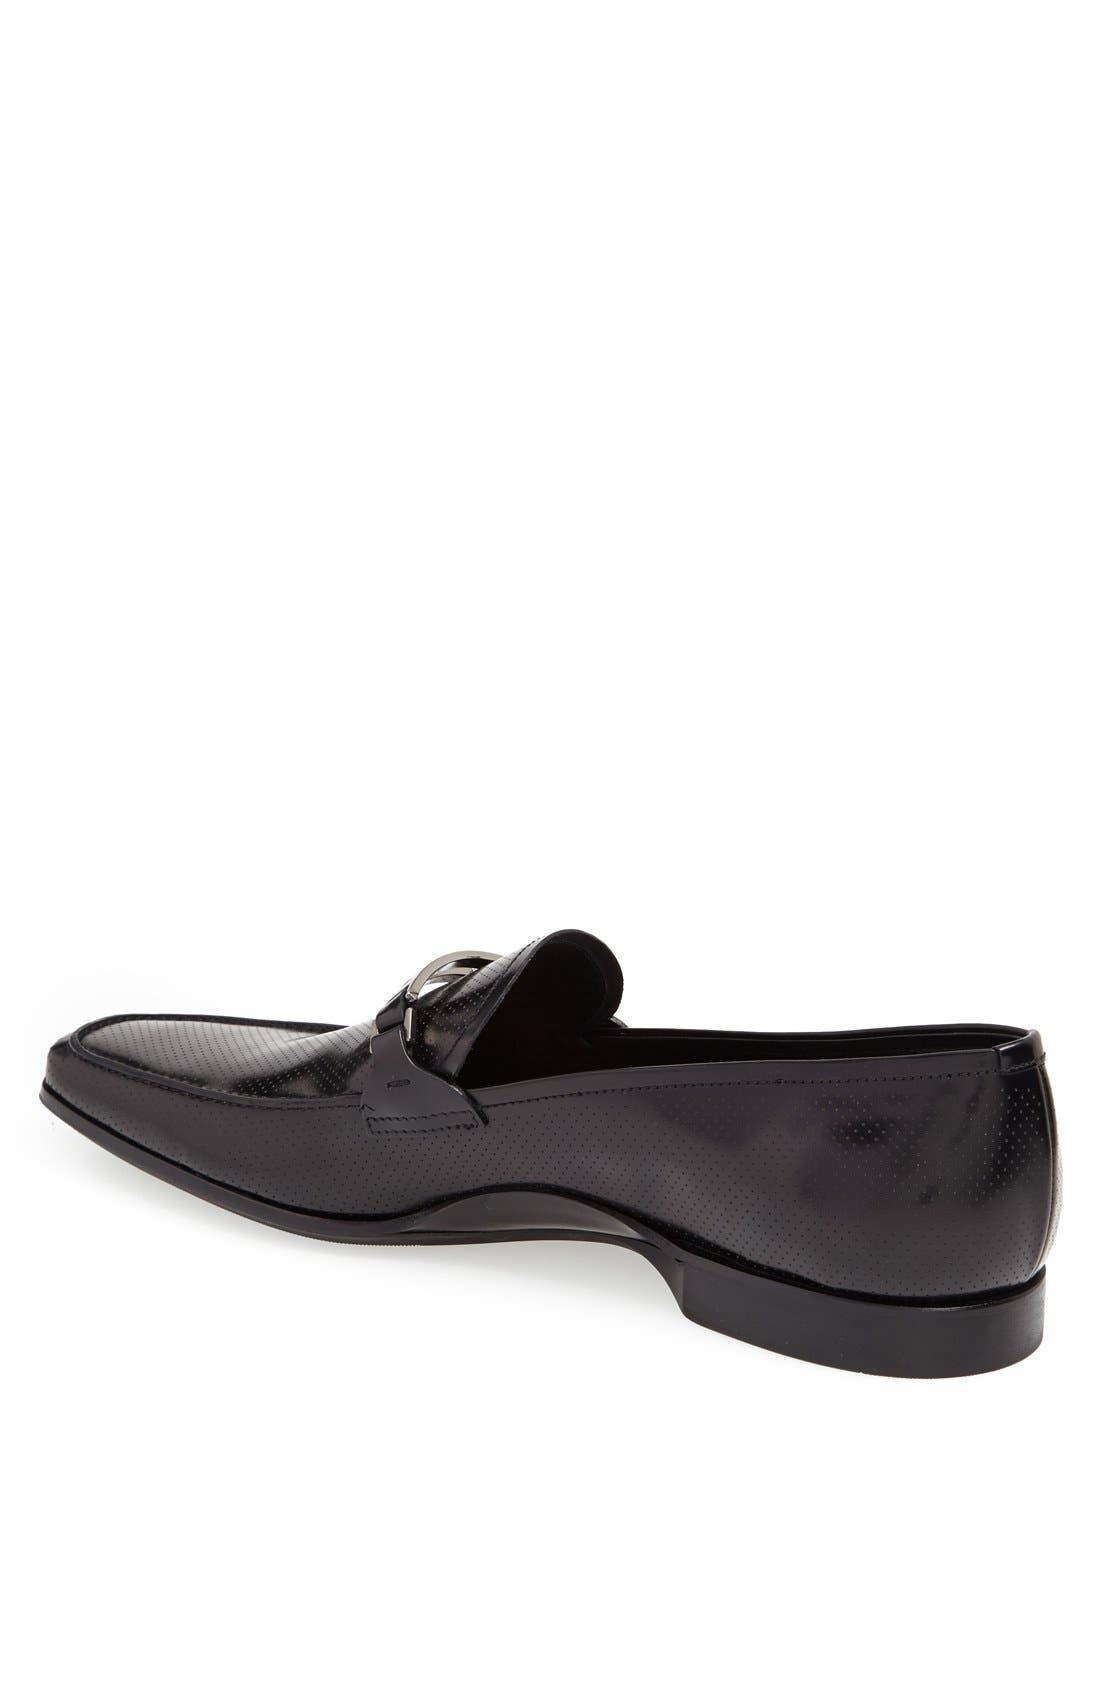 Alternate Image 2  - Prada Leather Bit Loafer